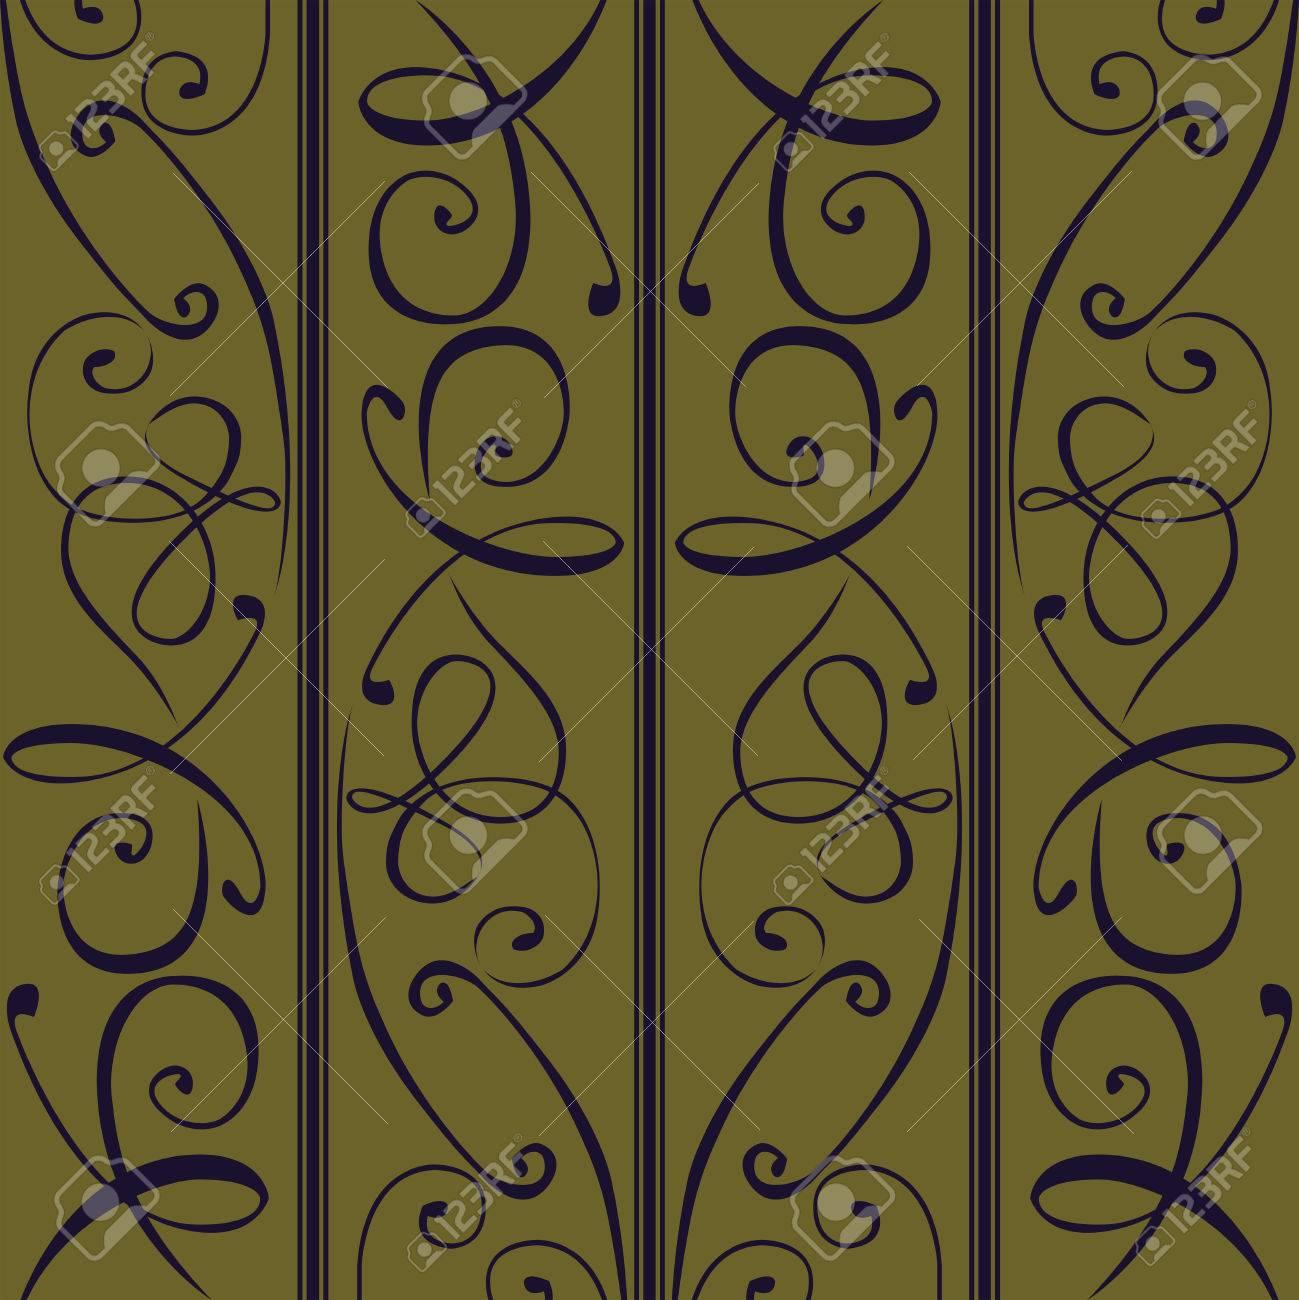 paris foliage, abstract texture, art illustration Stock Vector - 7097403